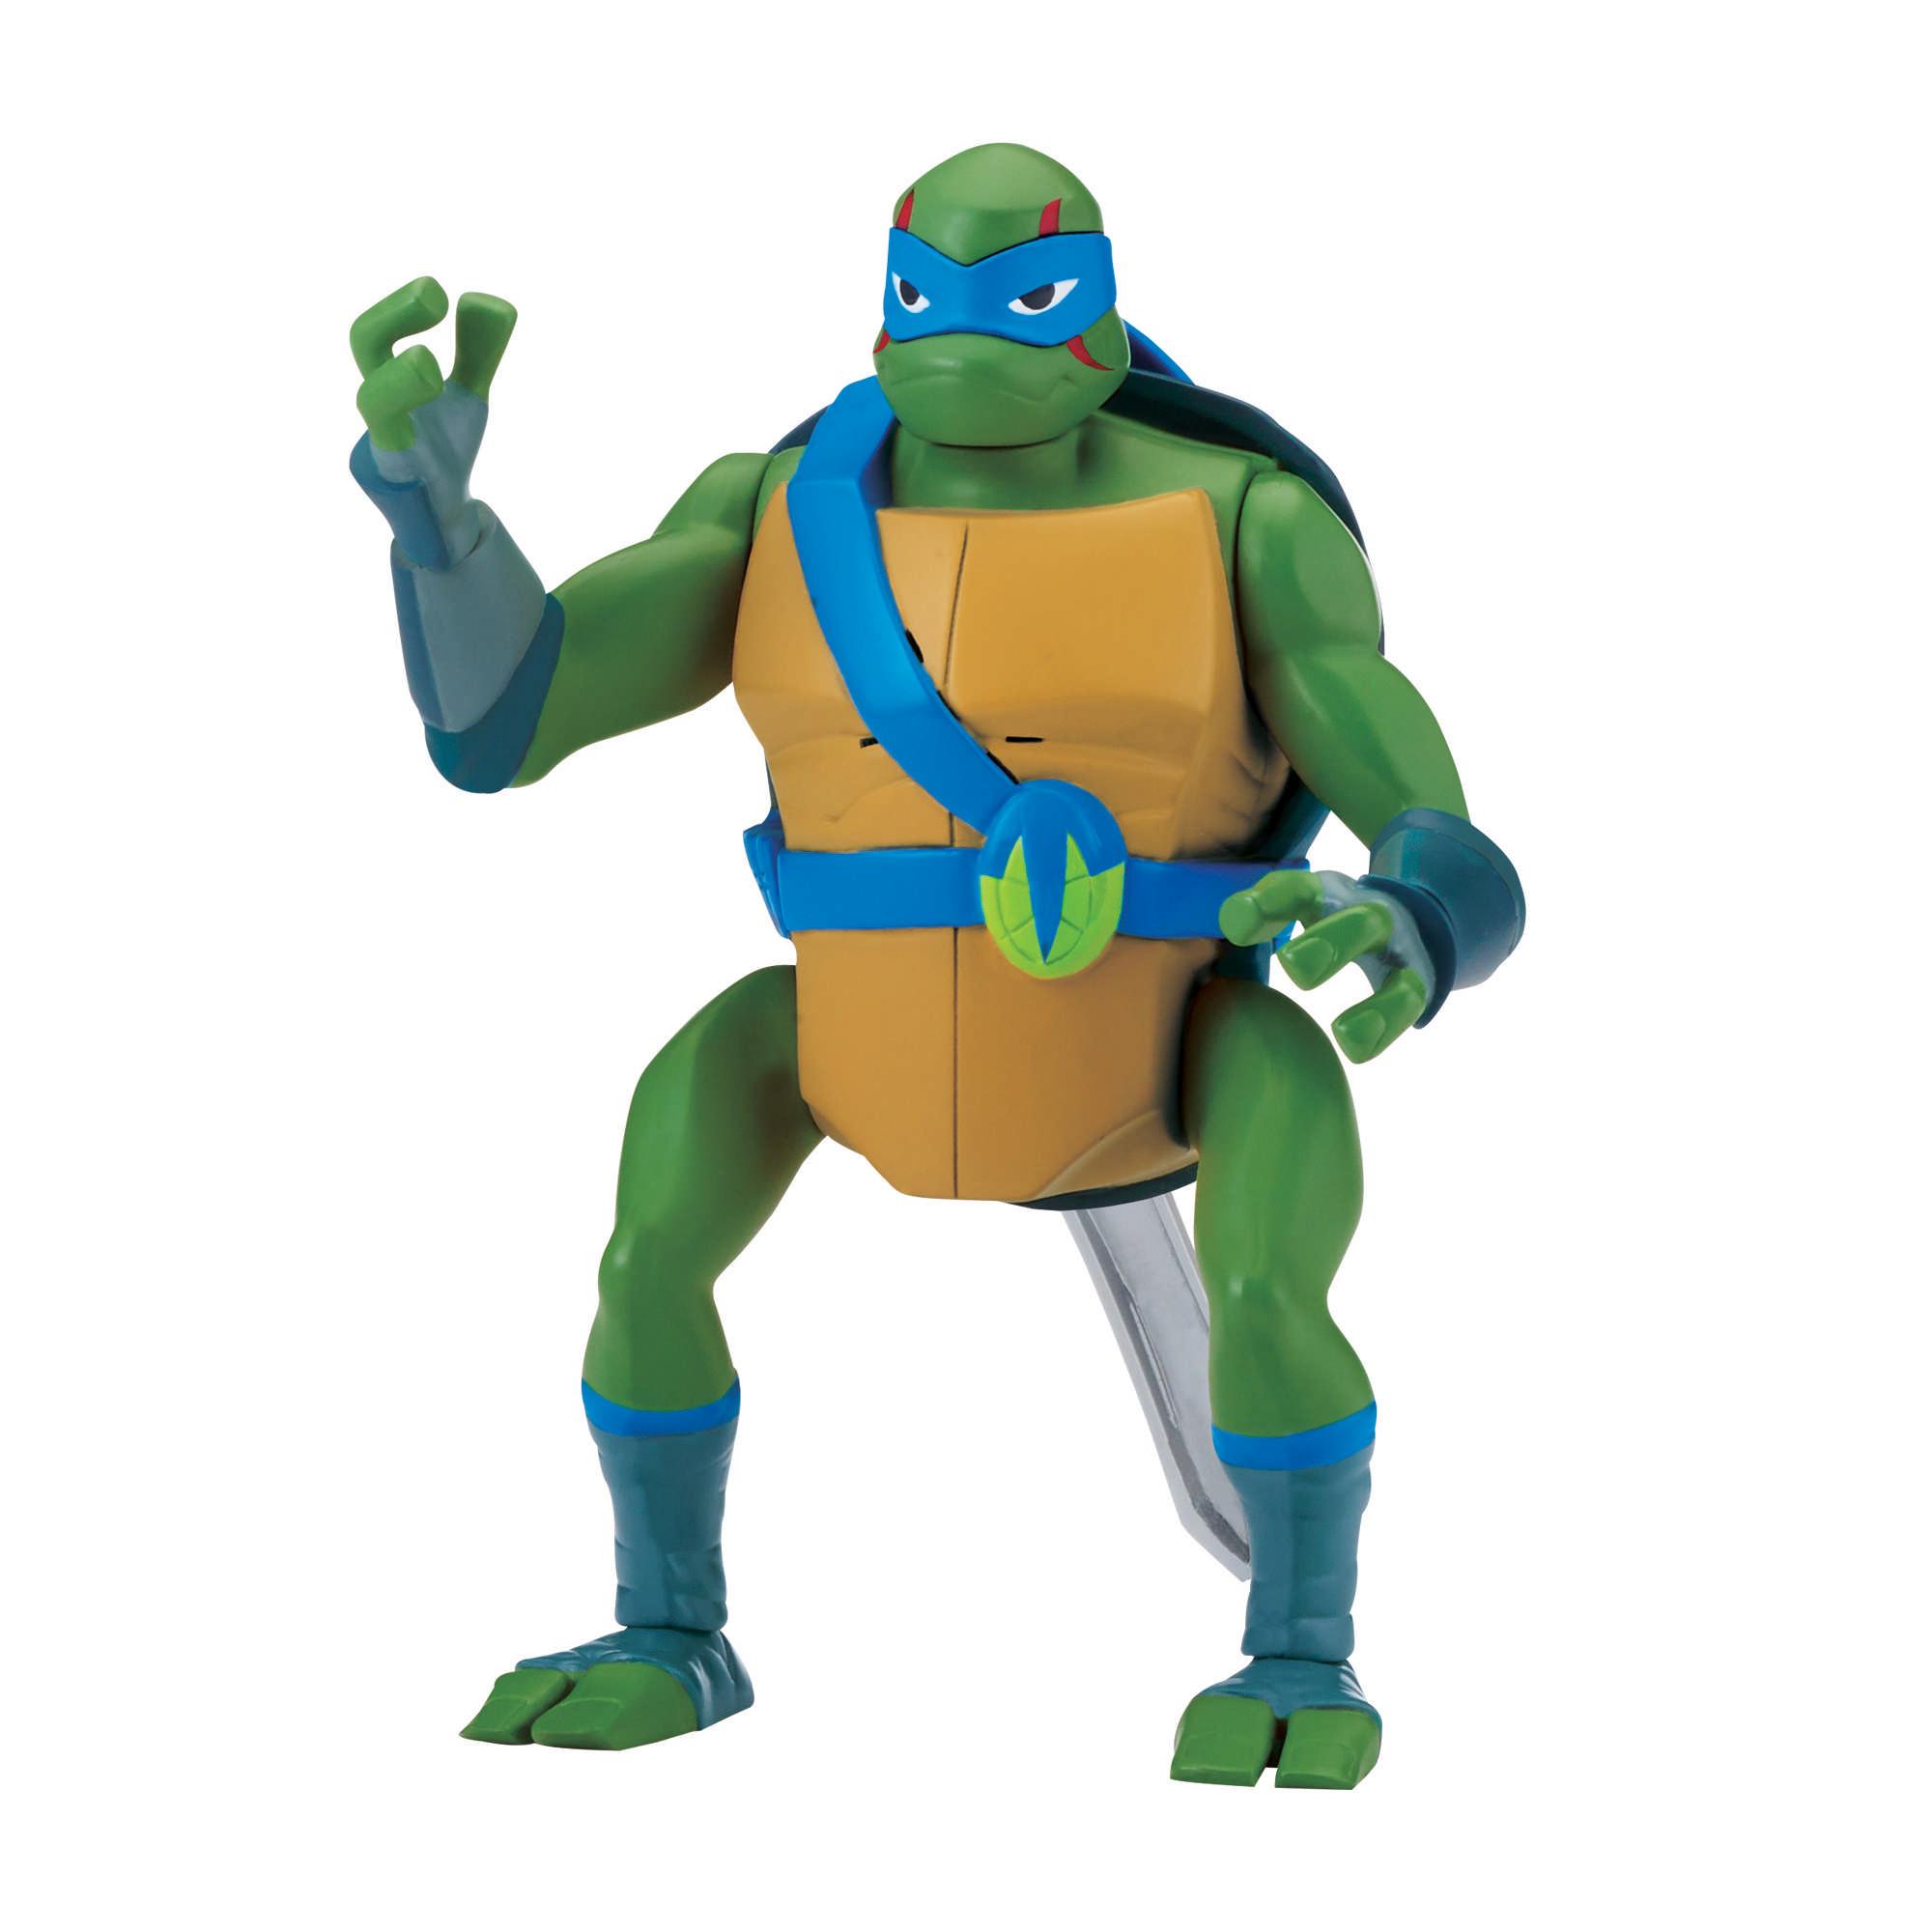 Deluxe Leonardo (2018 action figure)